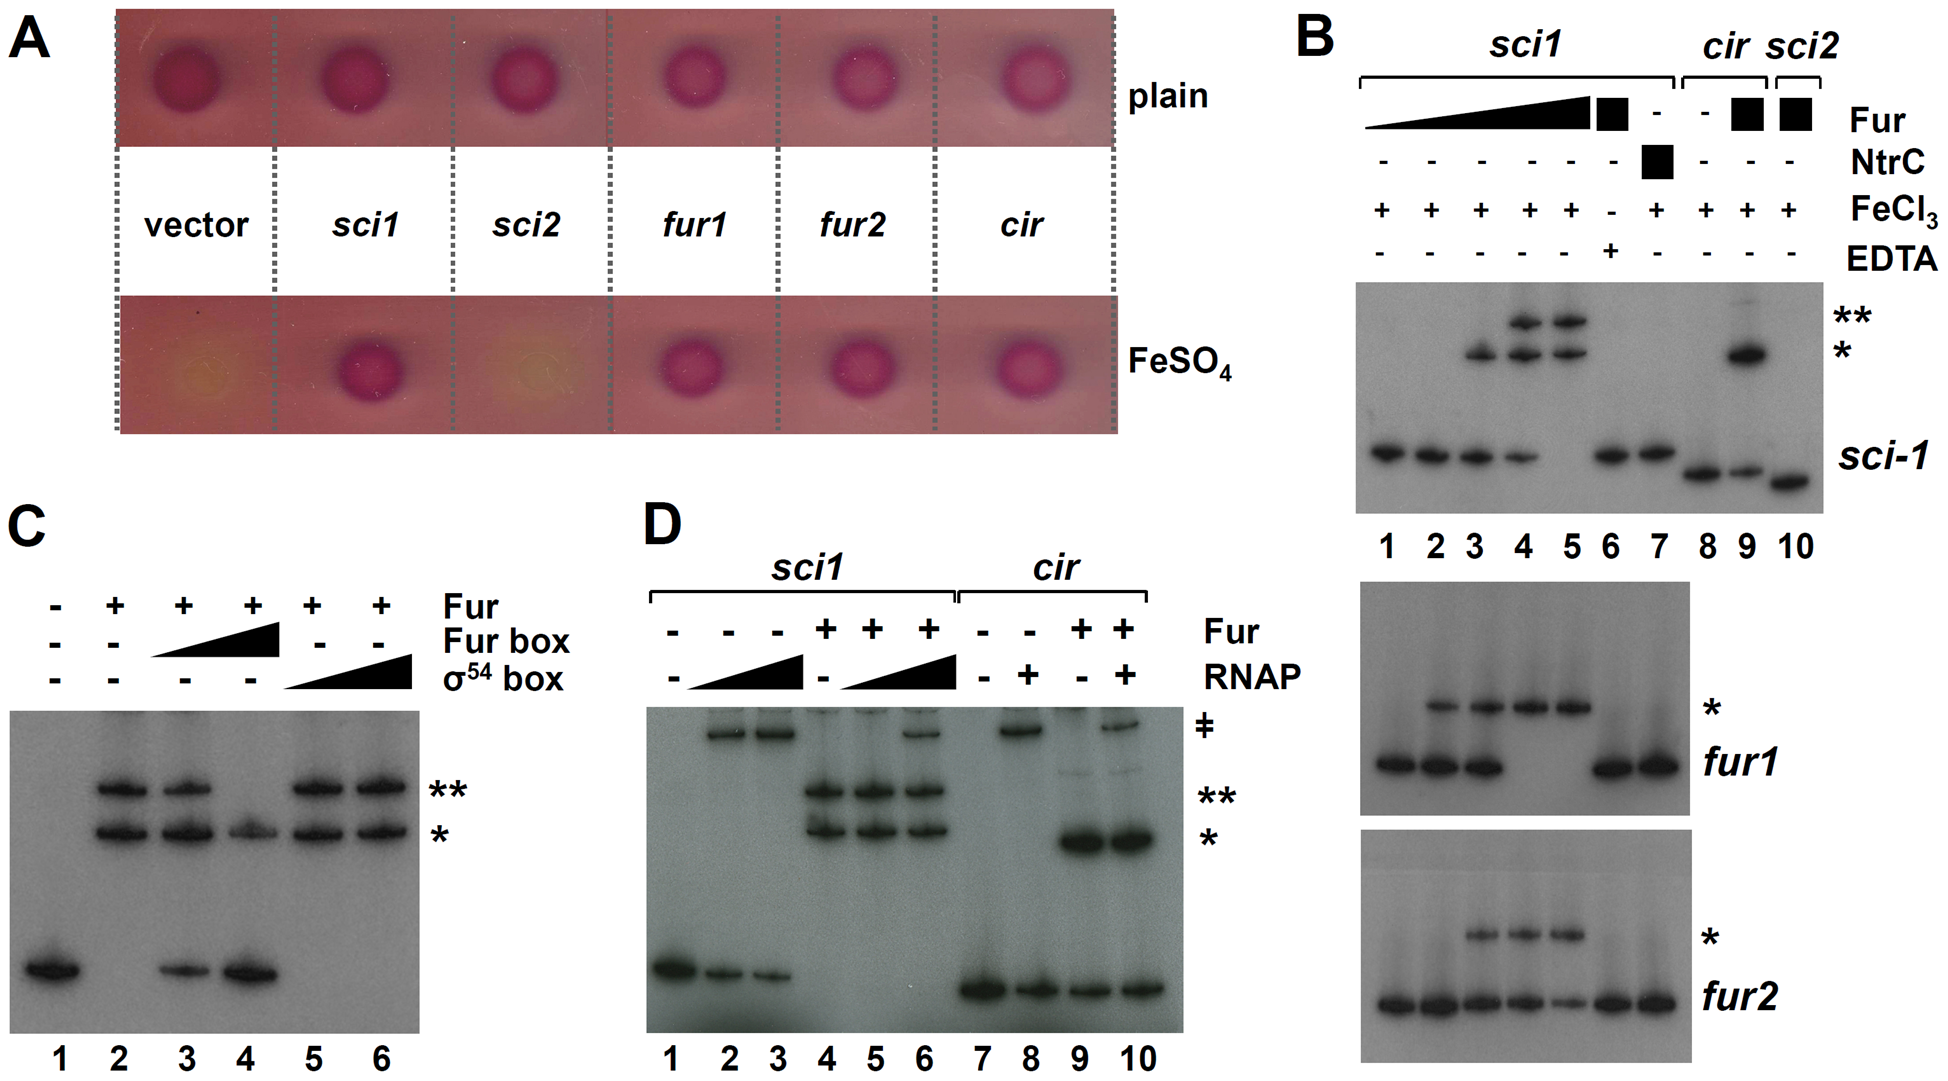 Fur binds to the EAEC <i>sci1</i> T6SS promoter <i>in vivo</i> and <i>in vitro.</i>